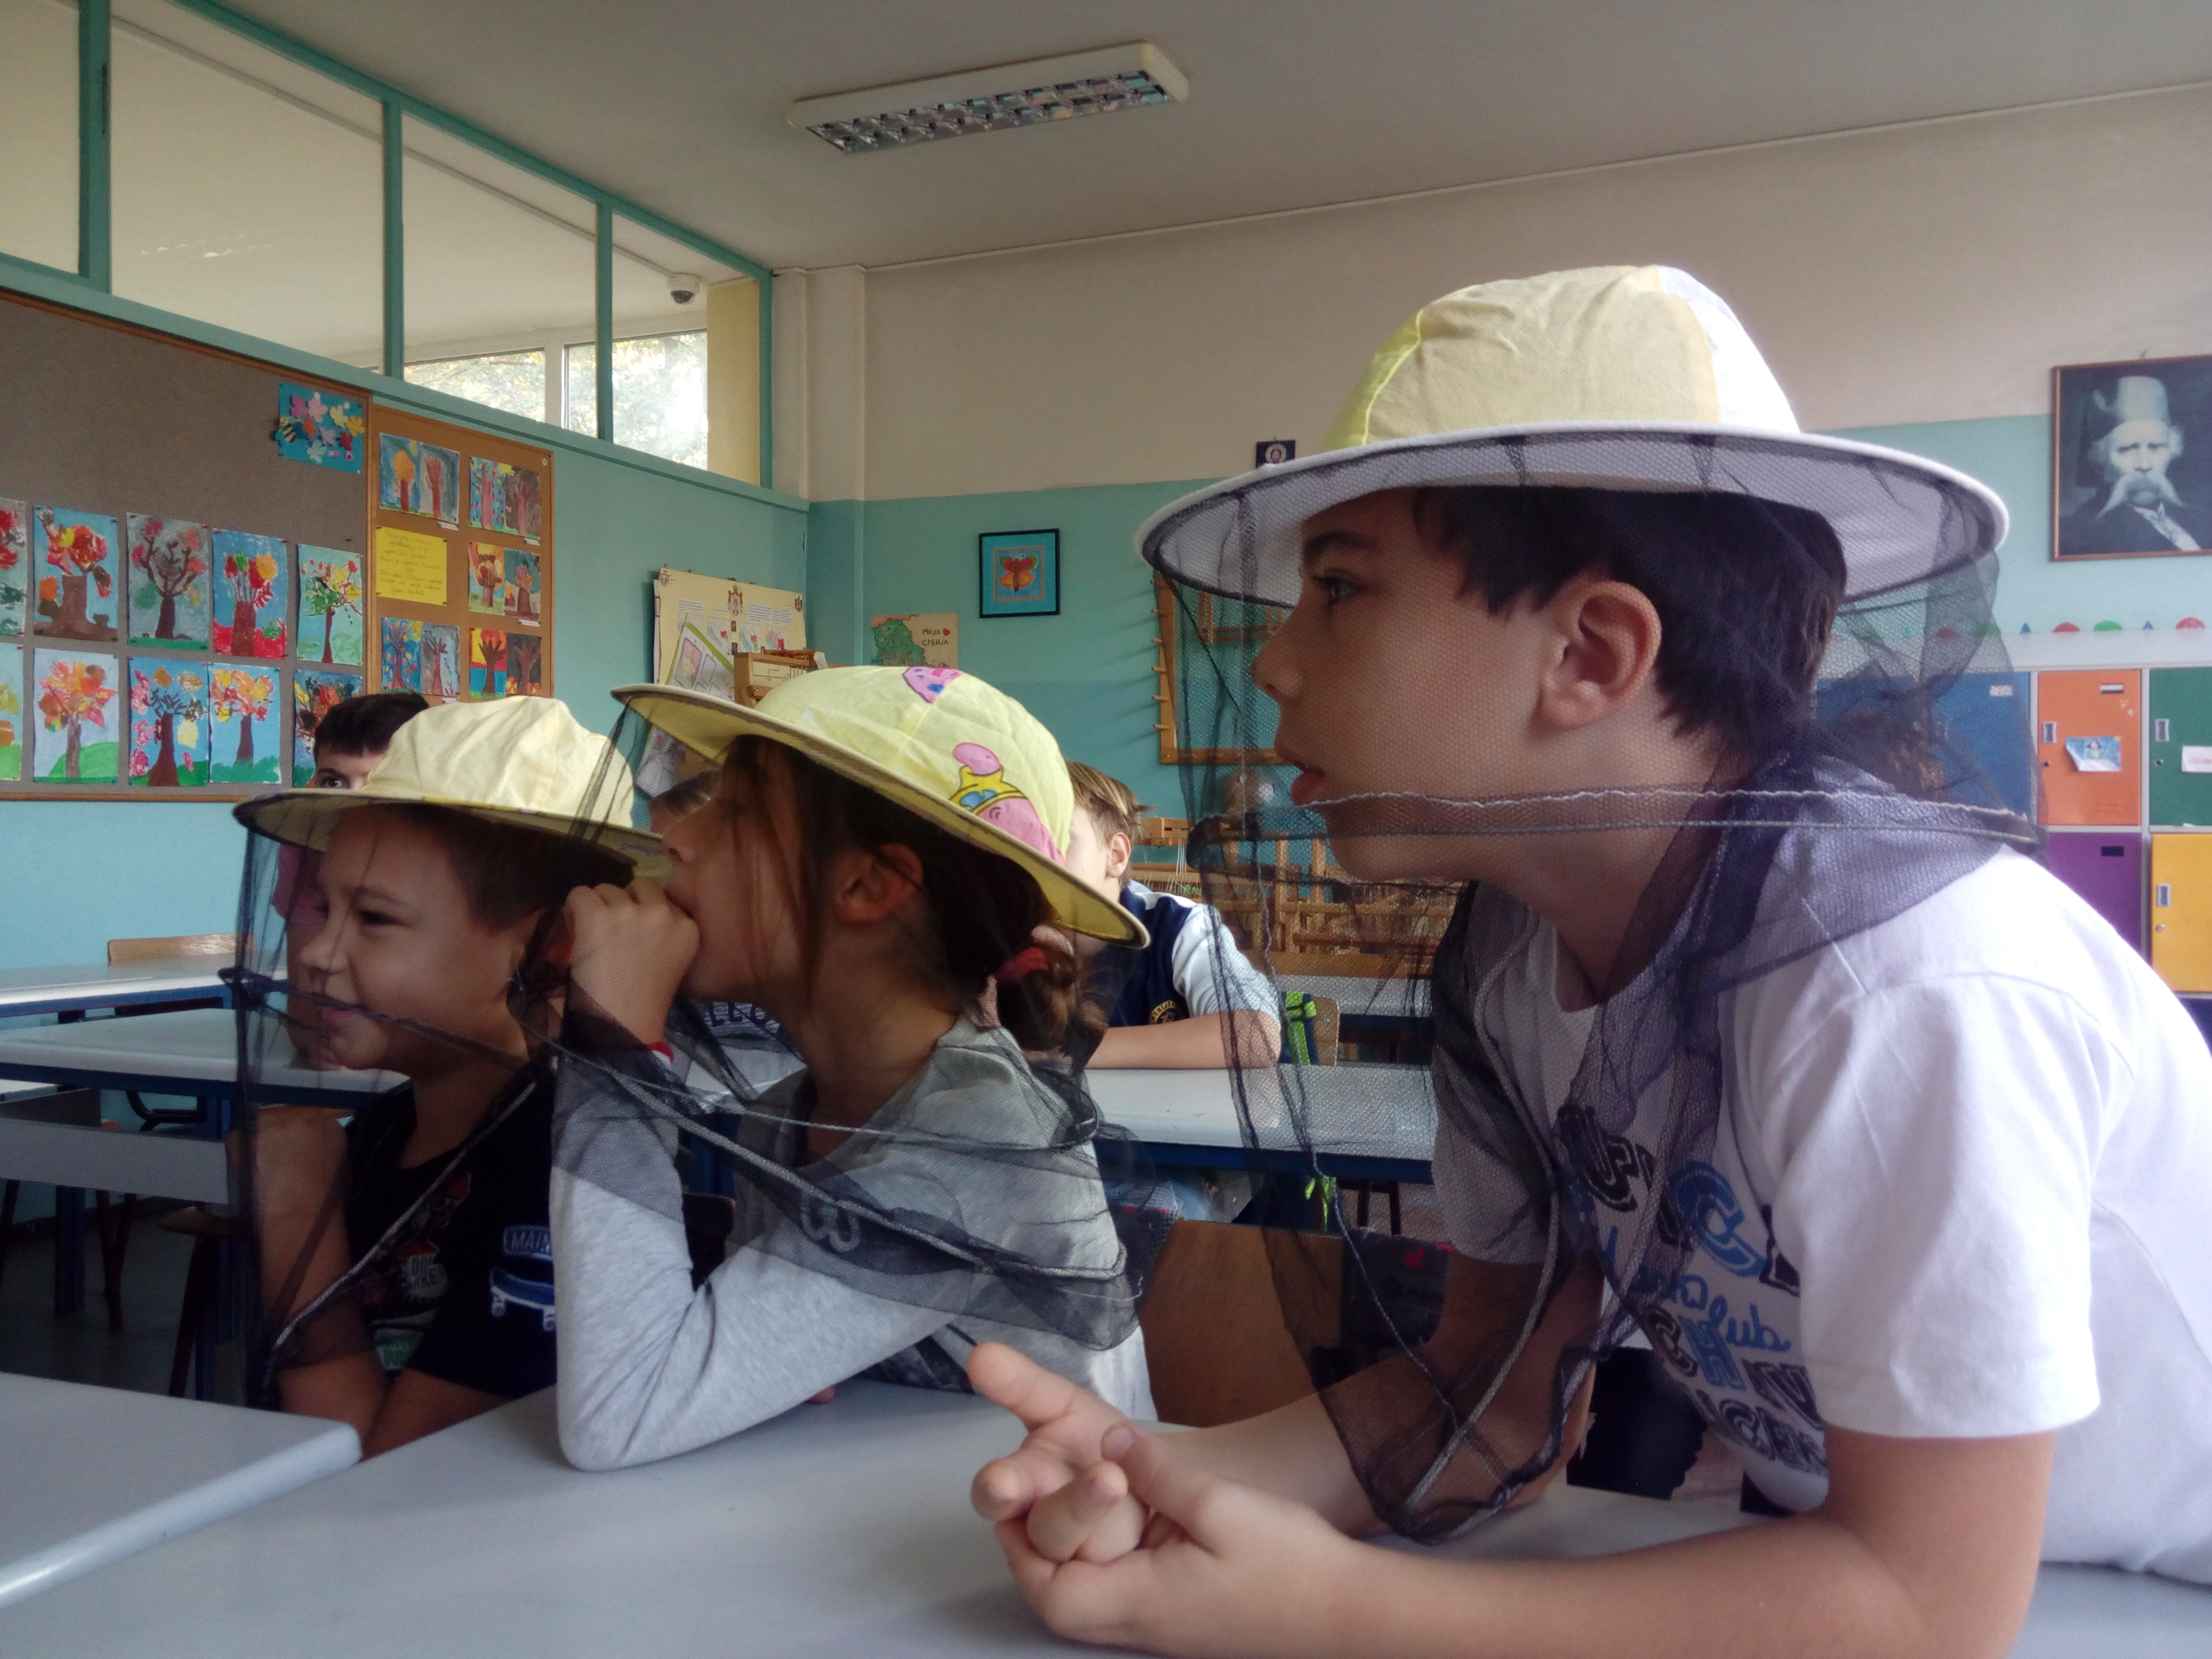 Pcelar i pcele u nasoj skoli (2)